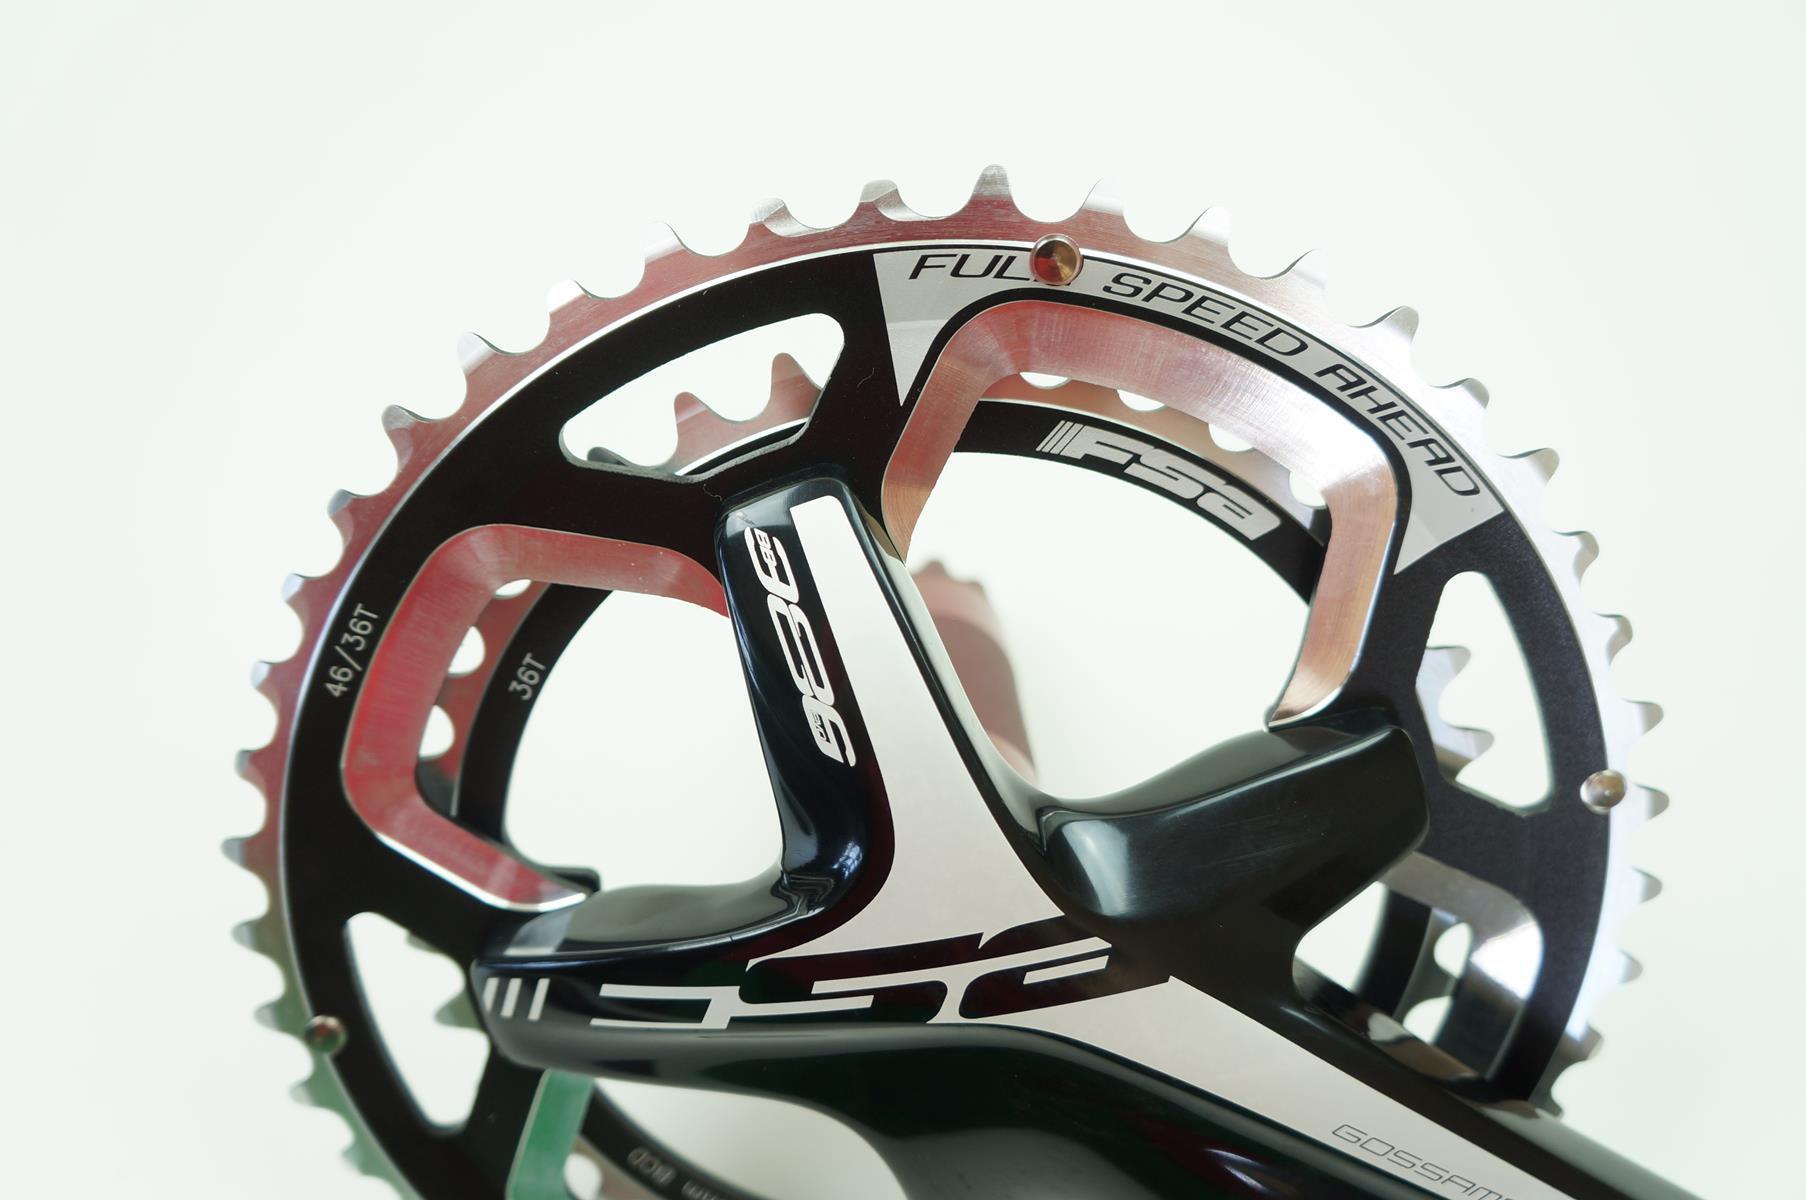 Pedivela Speed FSA Gossamer 175mm Coroas 46-36 dentes BB386 para Cyclocross